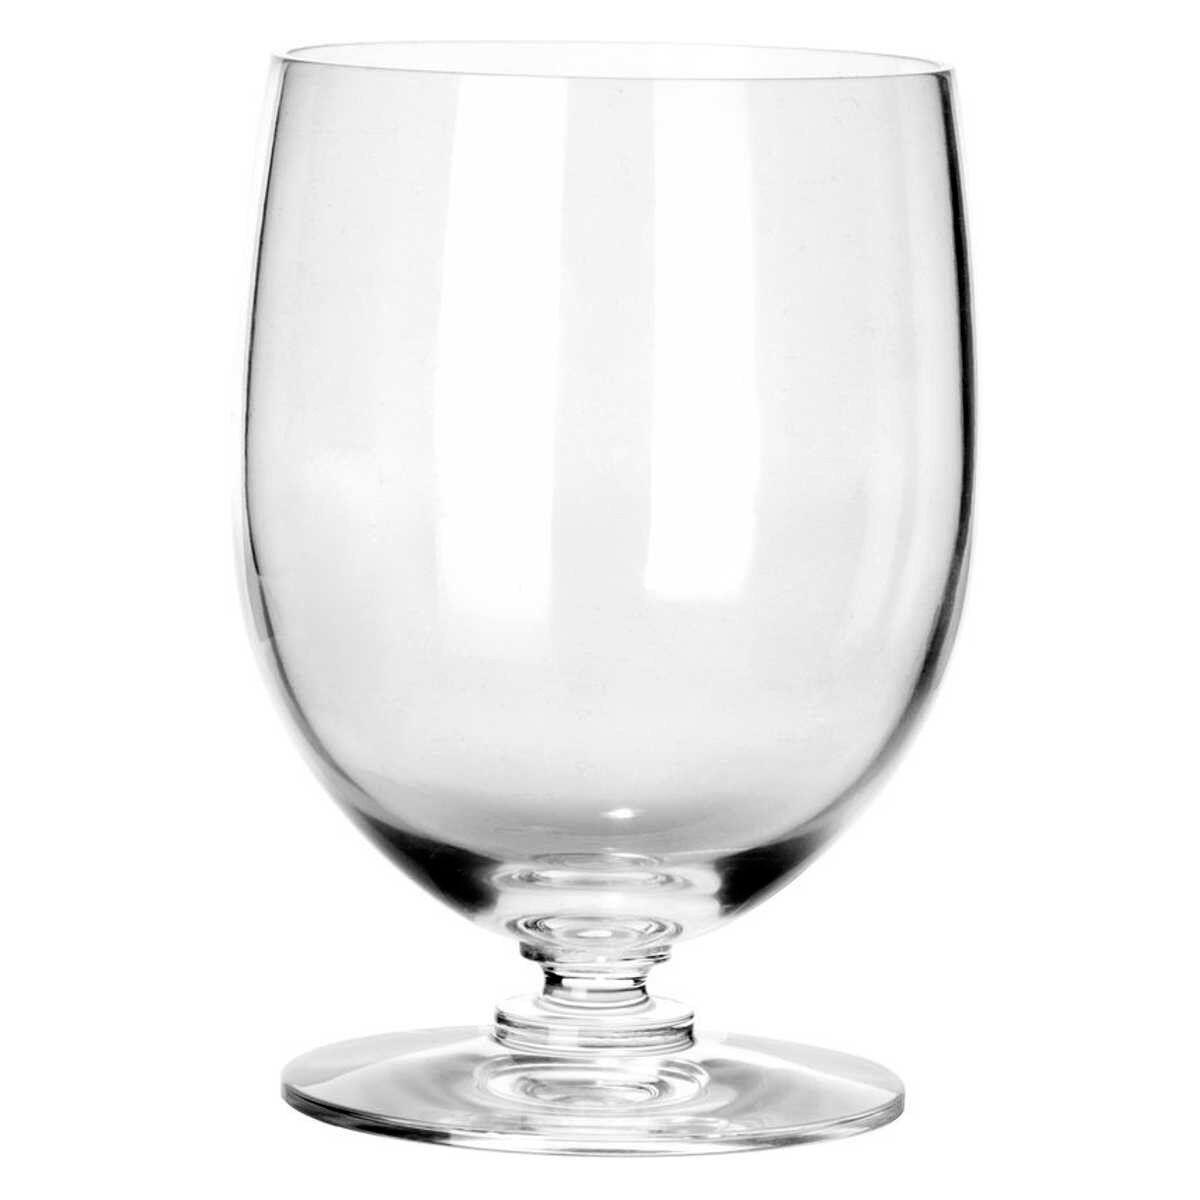 Alessi Dressed Marcel Wanders Design Vasos Agua cristal 6 unidades